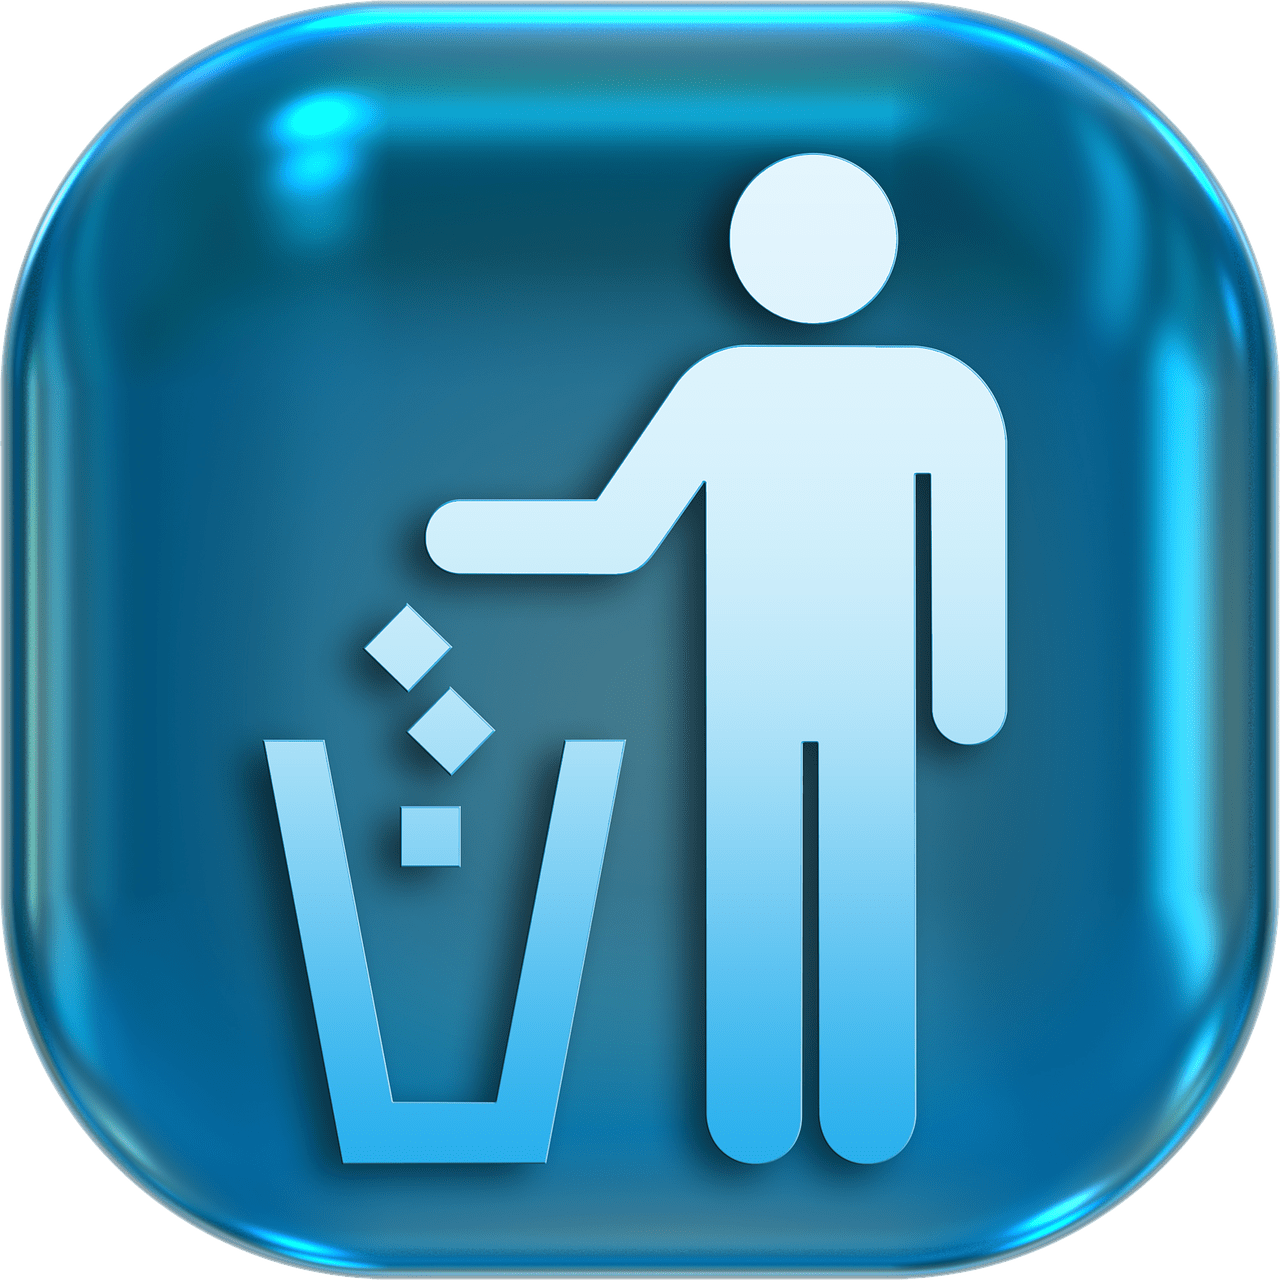 Sklep z koszami na odpady